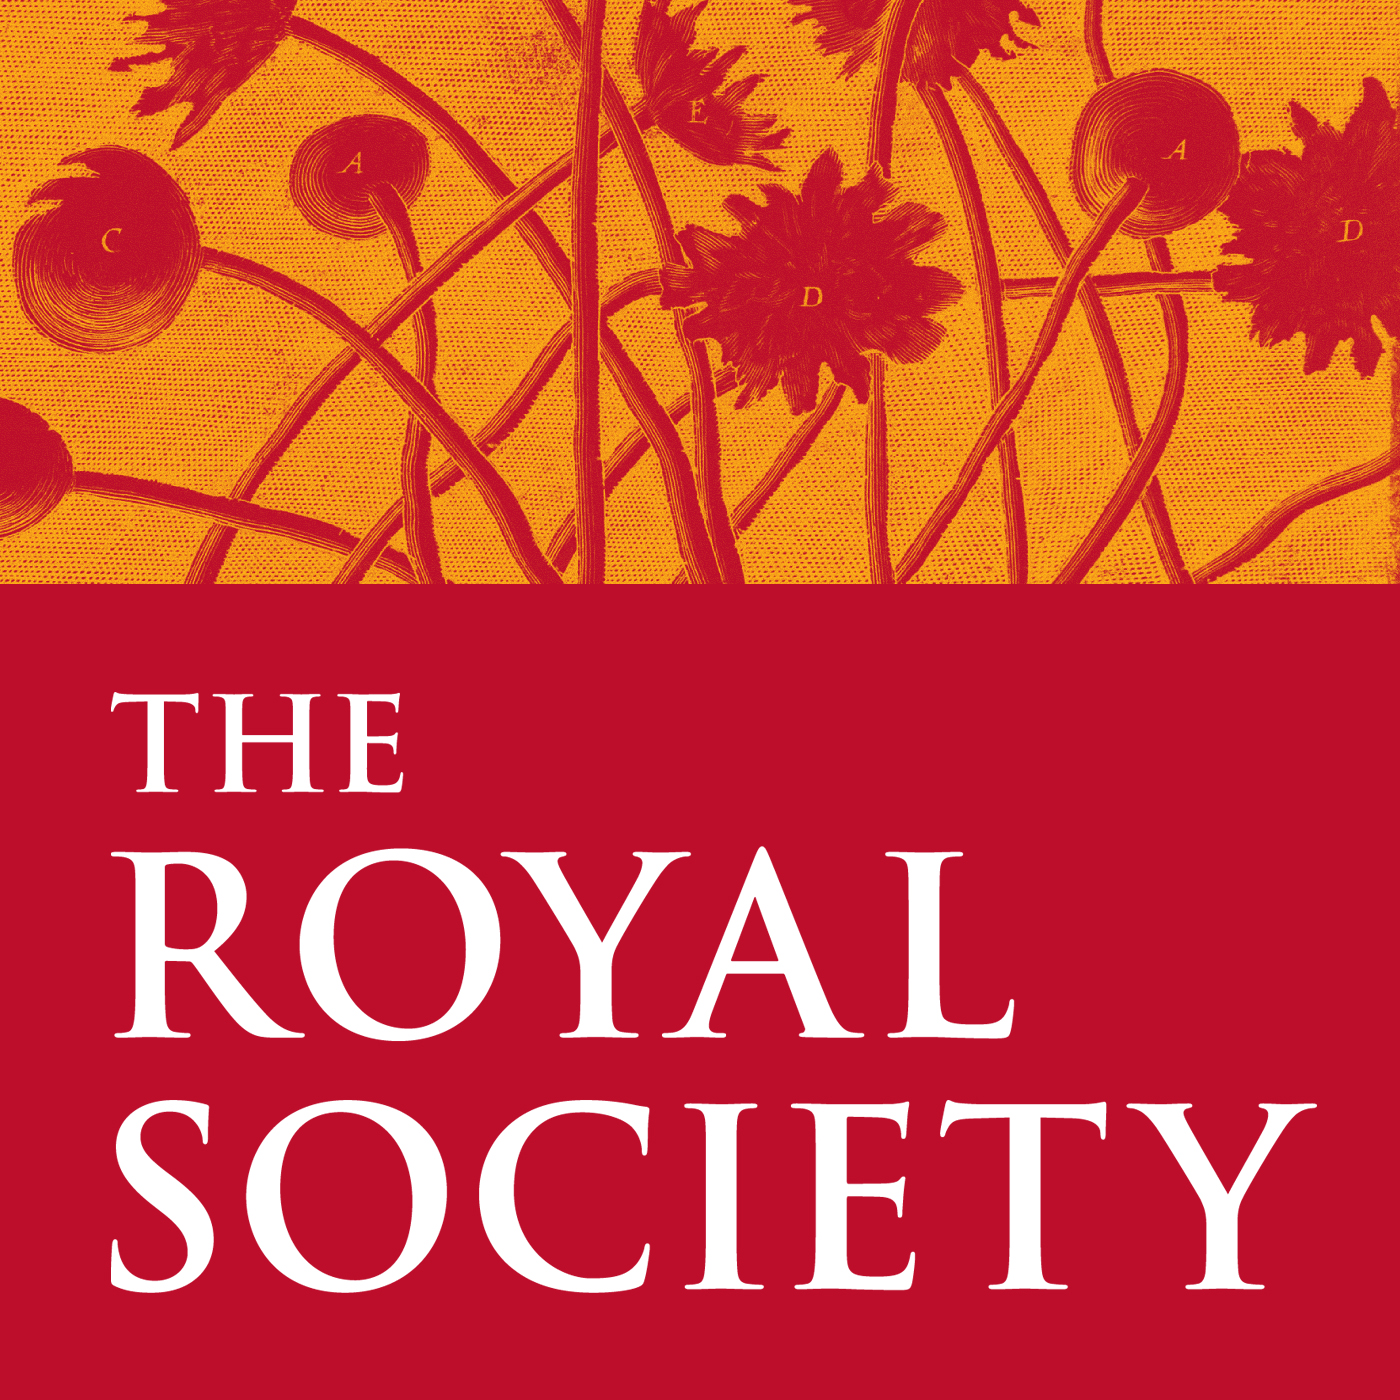 History of science | Royal Society